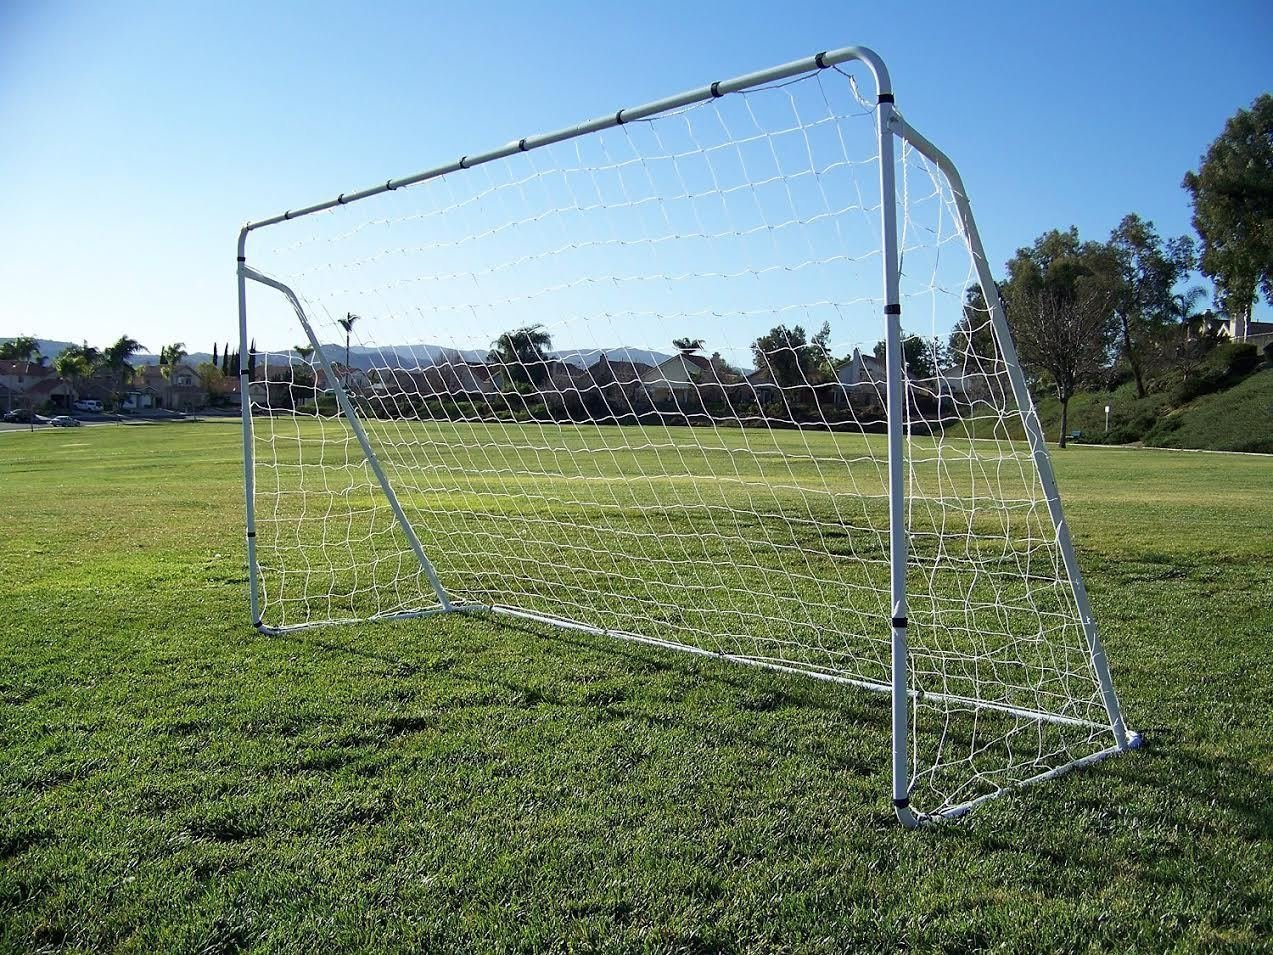 spiritone Soccer Goal 12 ' x 6 ' Football W/Netストラップ、アンカーボールトレーニングセットスポーツ B07CXMZGTP